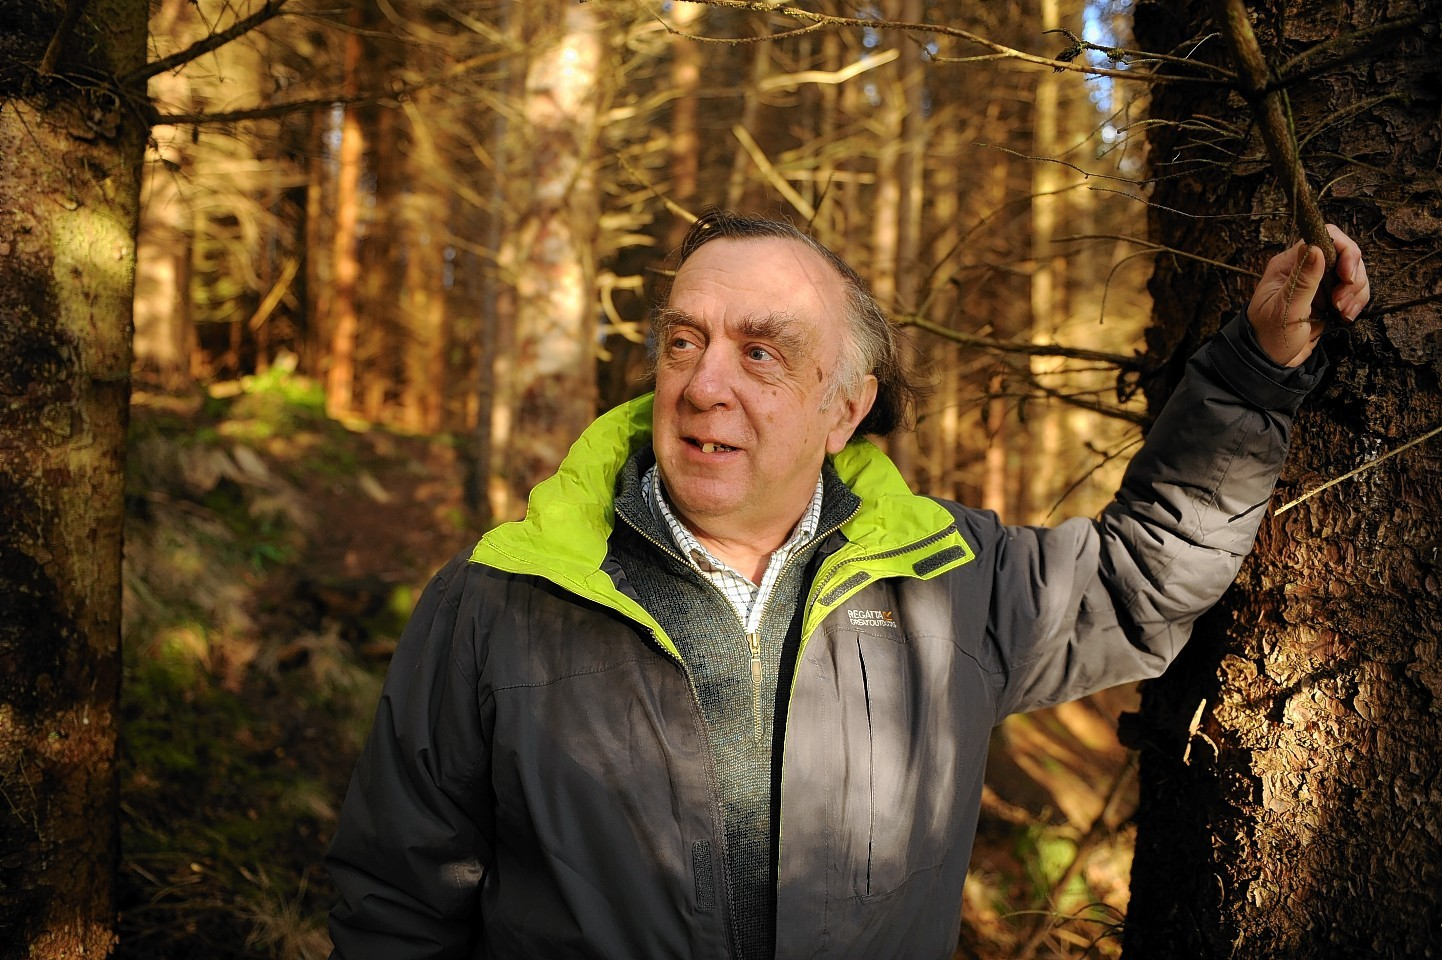 John Graham, treasurer of Aigas Community Woodland